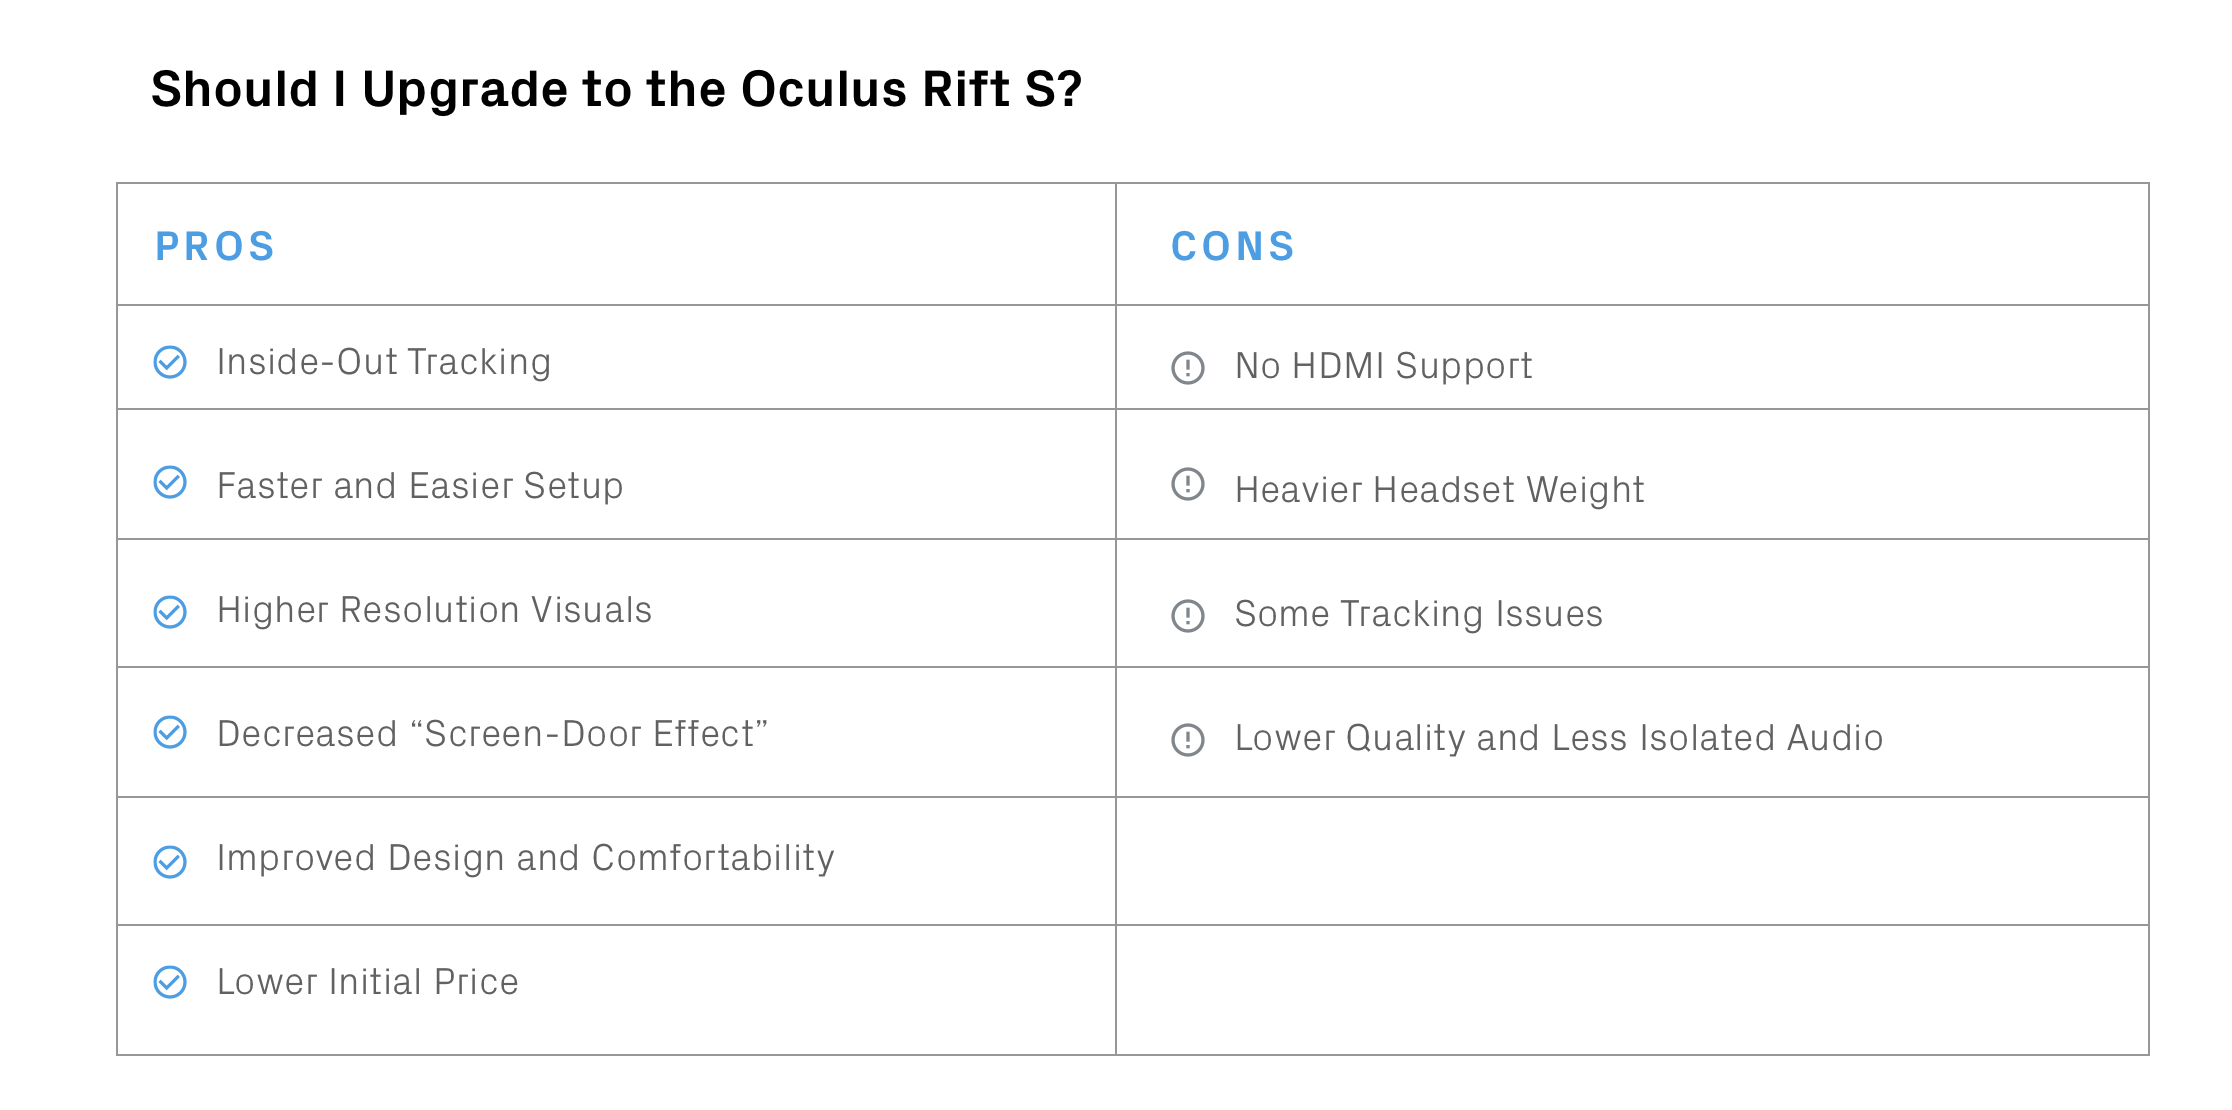 Oculus Rift S - Should I Upgrade?